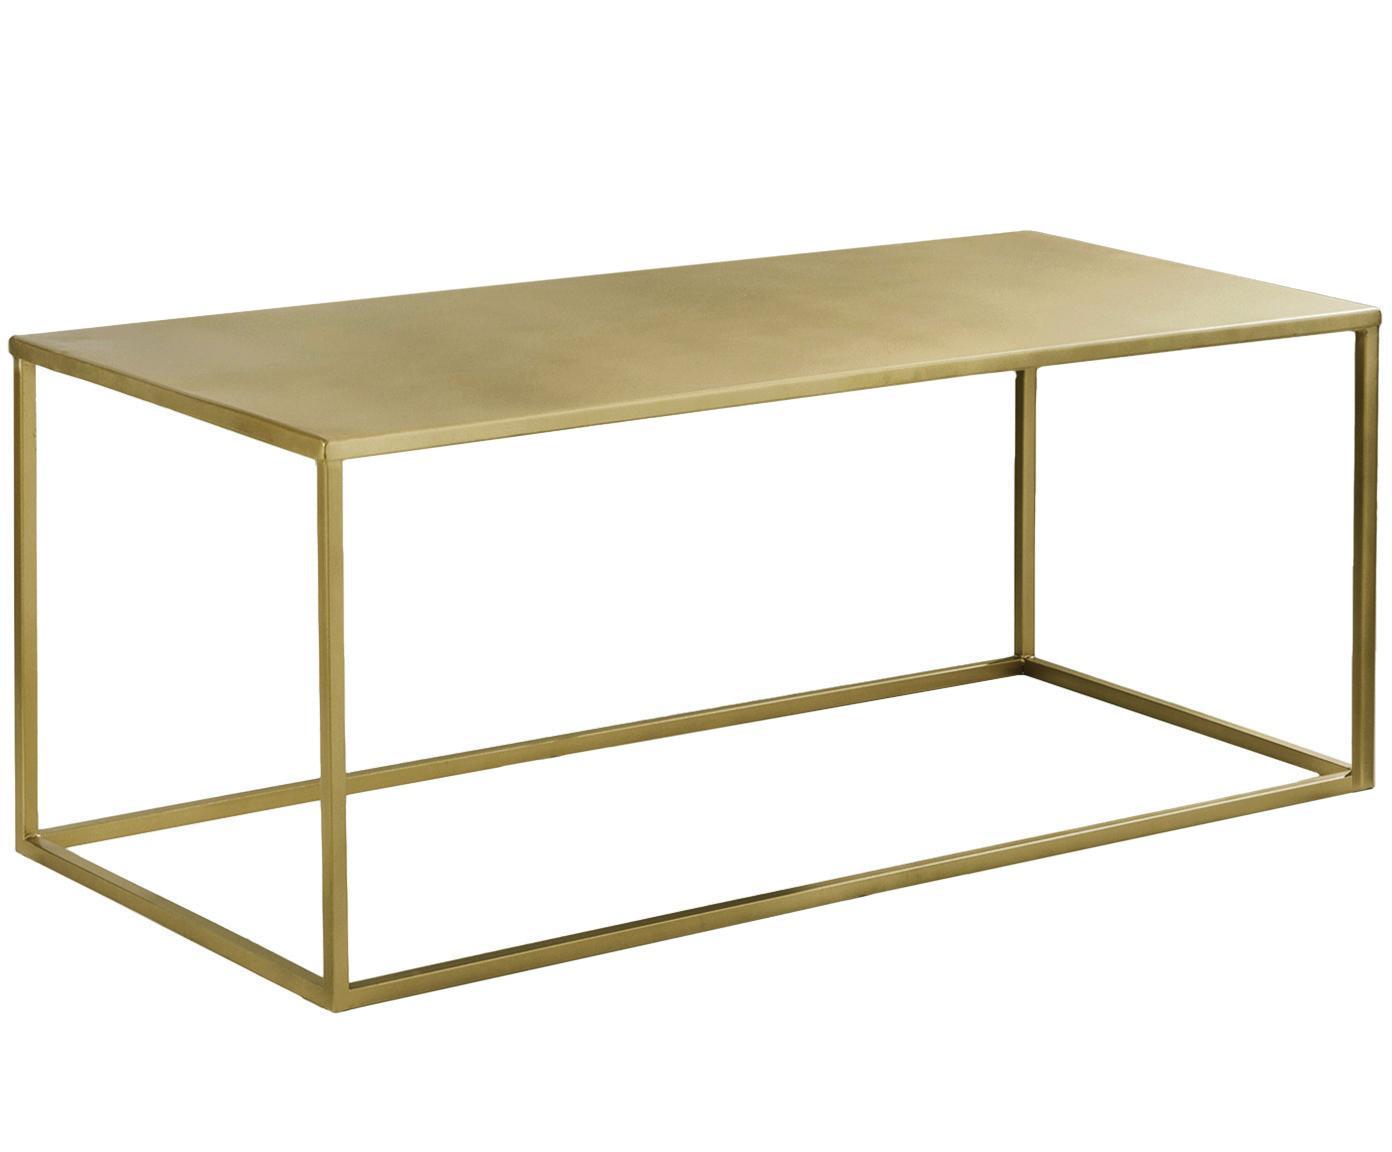 Couchtisch Stina aus Metall, Metall, pulverbeschichtet, Goldfarben, matt, 90 x 45 cm